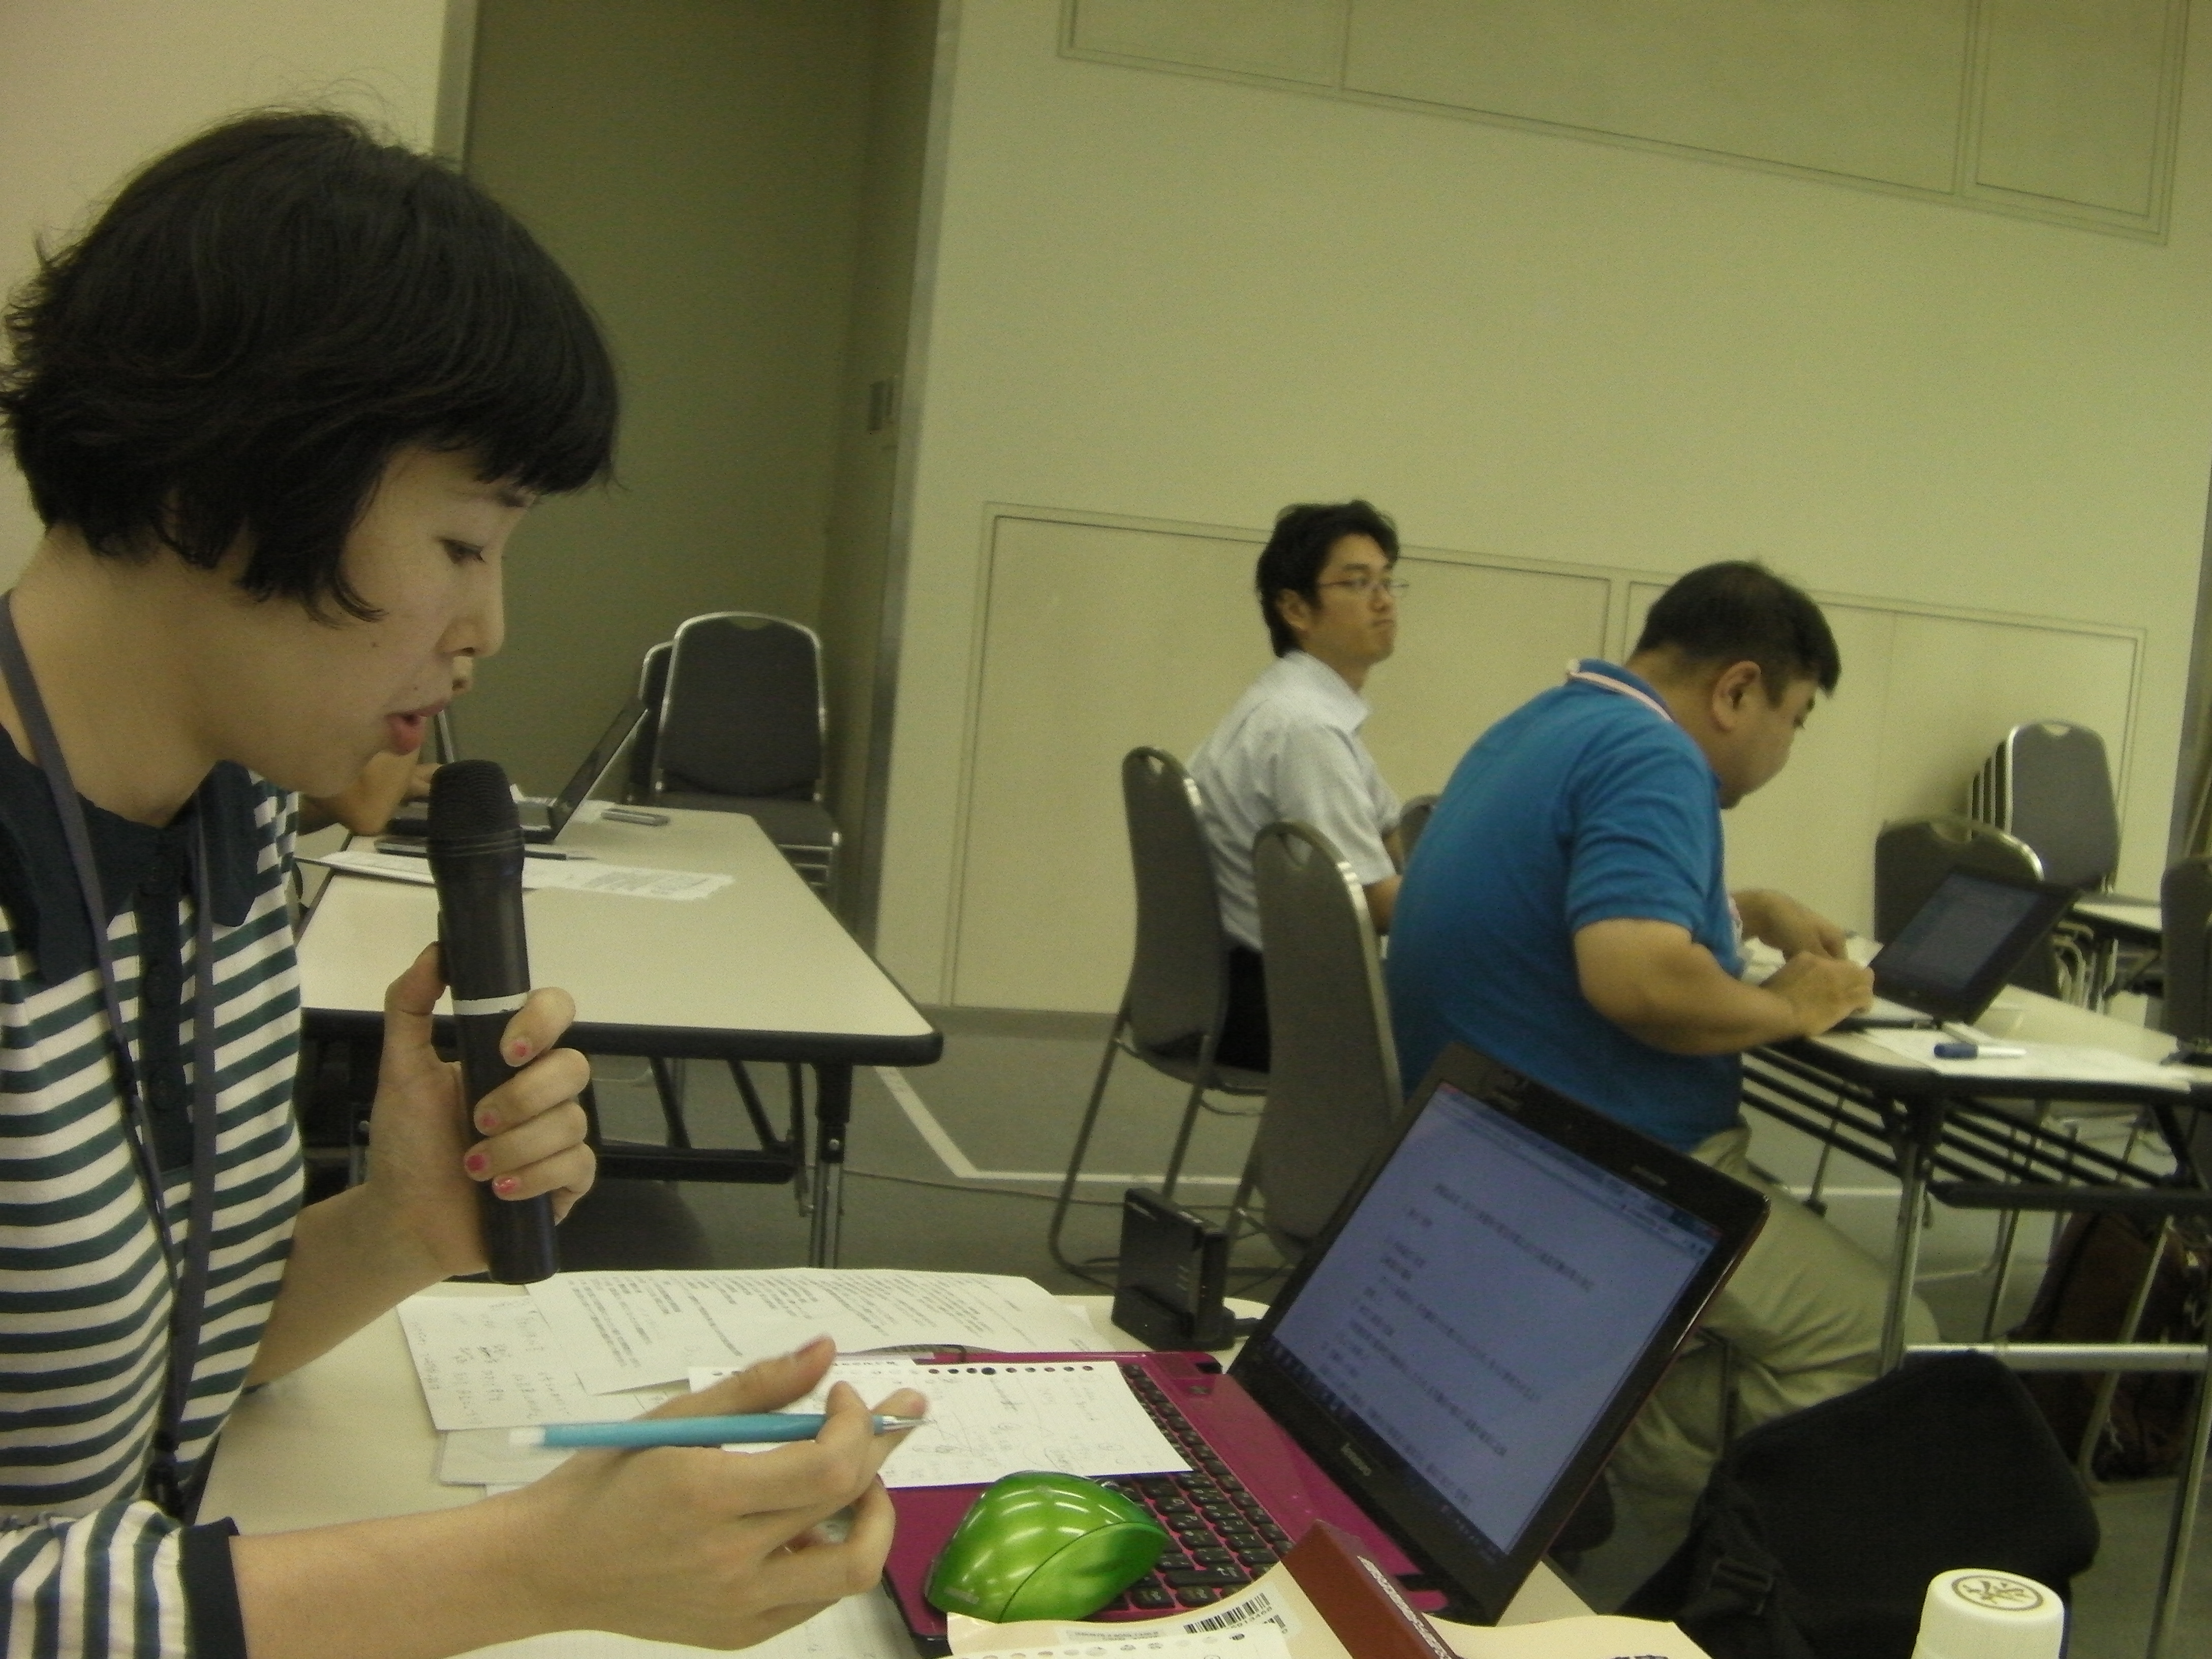 http://daily.magazine9.jp/m9/oshidori/SANY0528.JPG